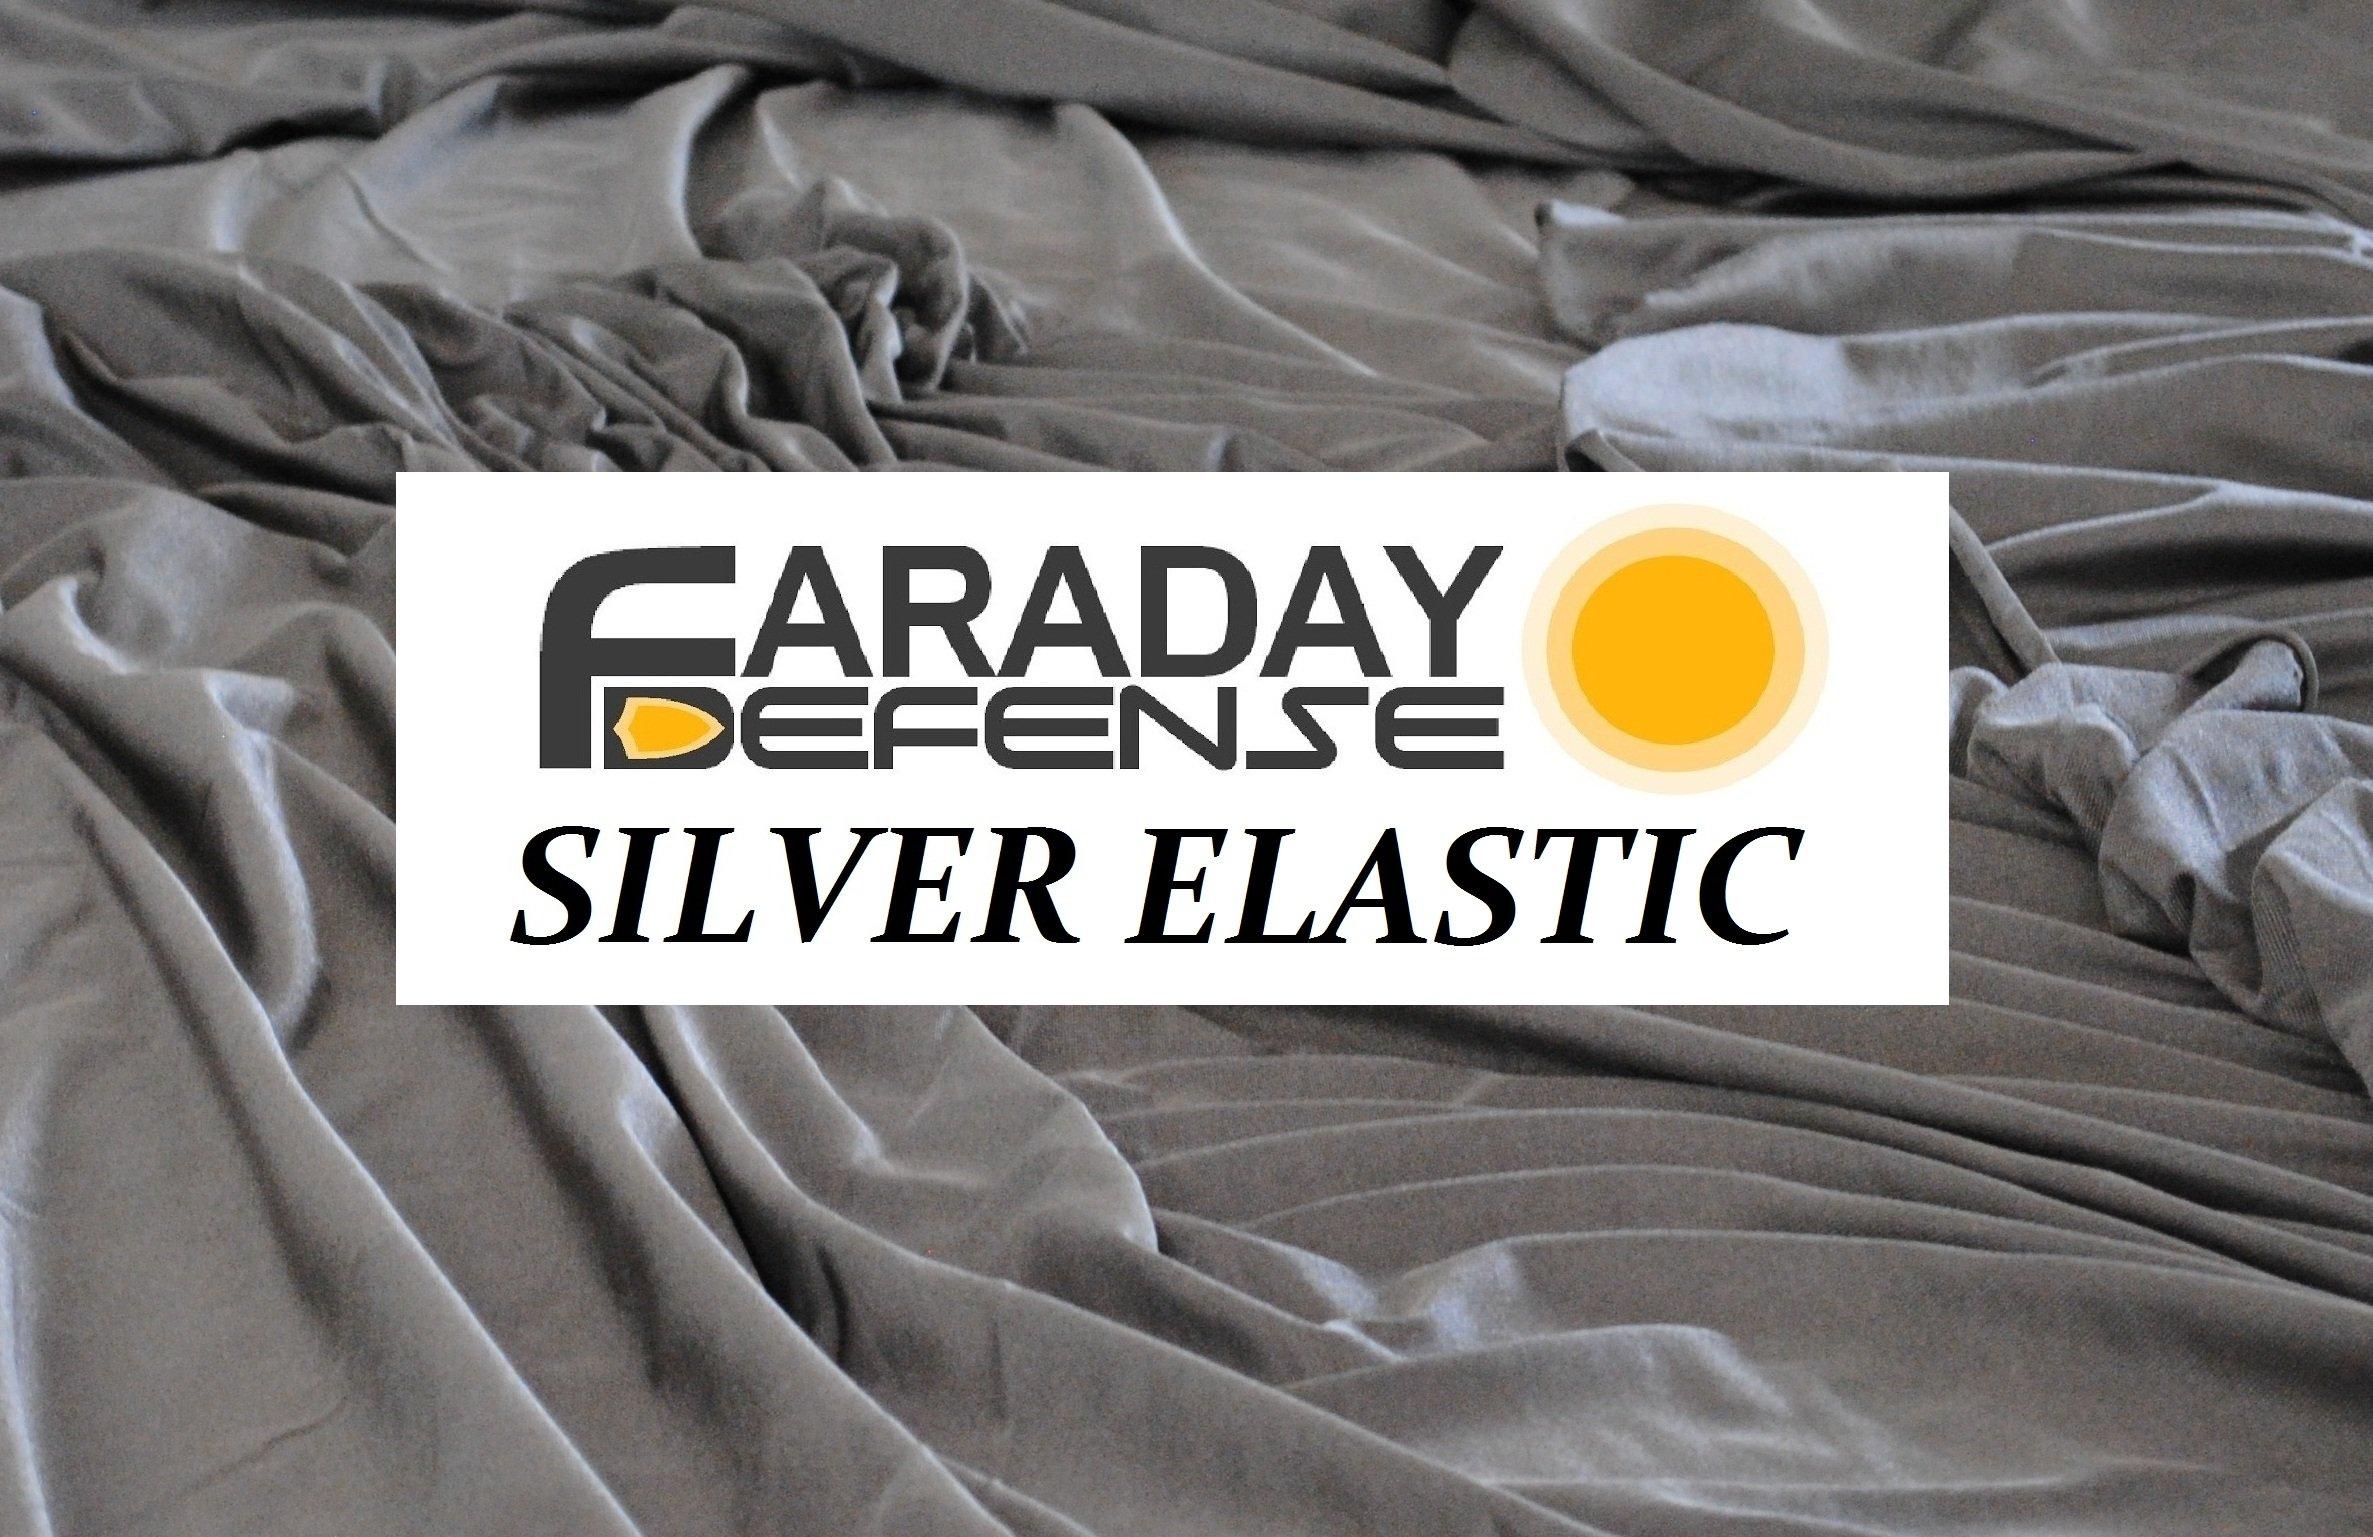 RFID Shielding Silver Fabric Roll 64'' x 3 Ft. - Premium Grade EMF Signal Blocking Material by Faraday Defense